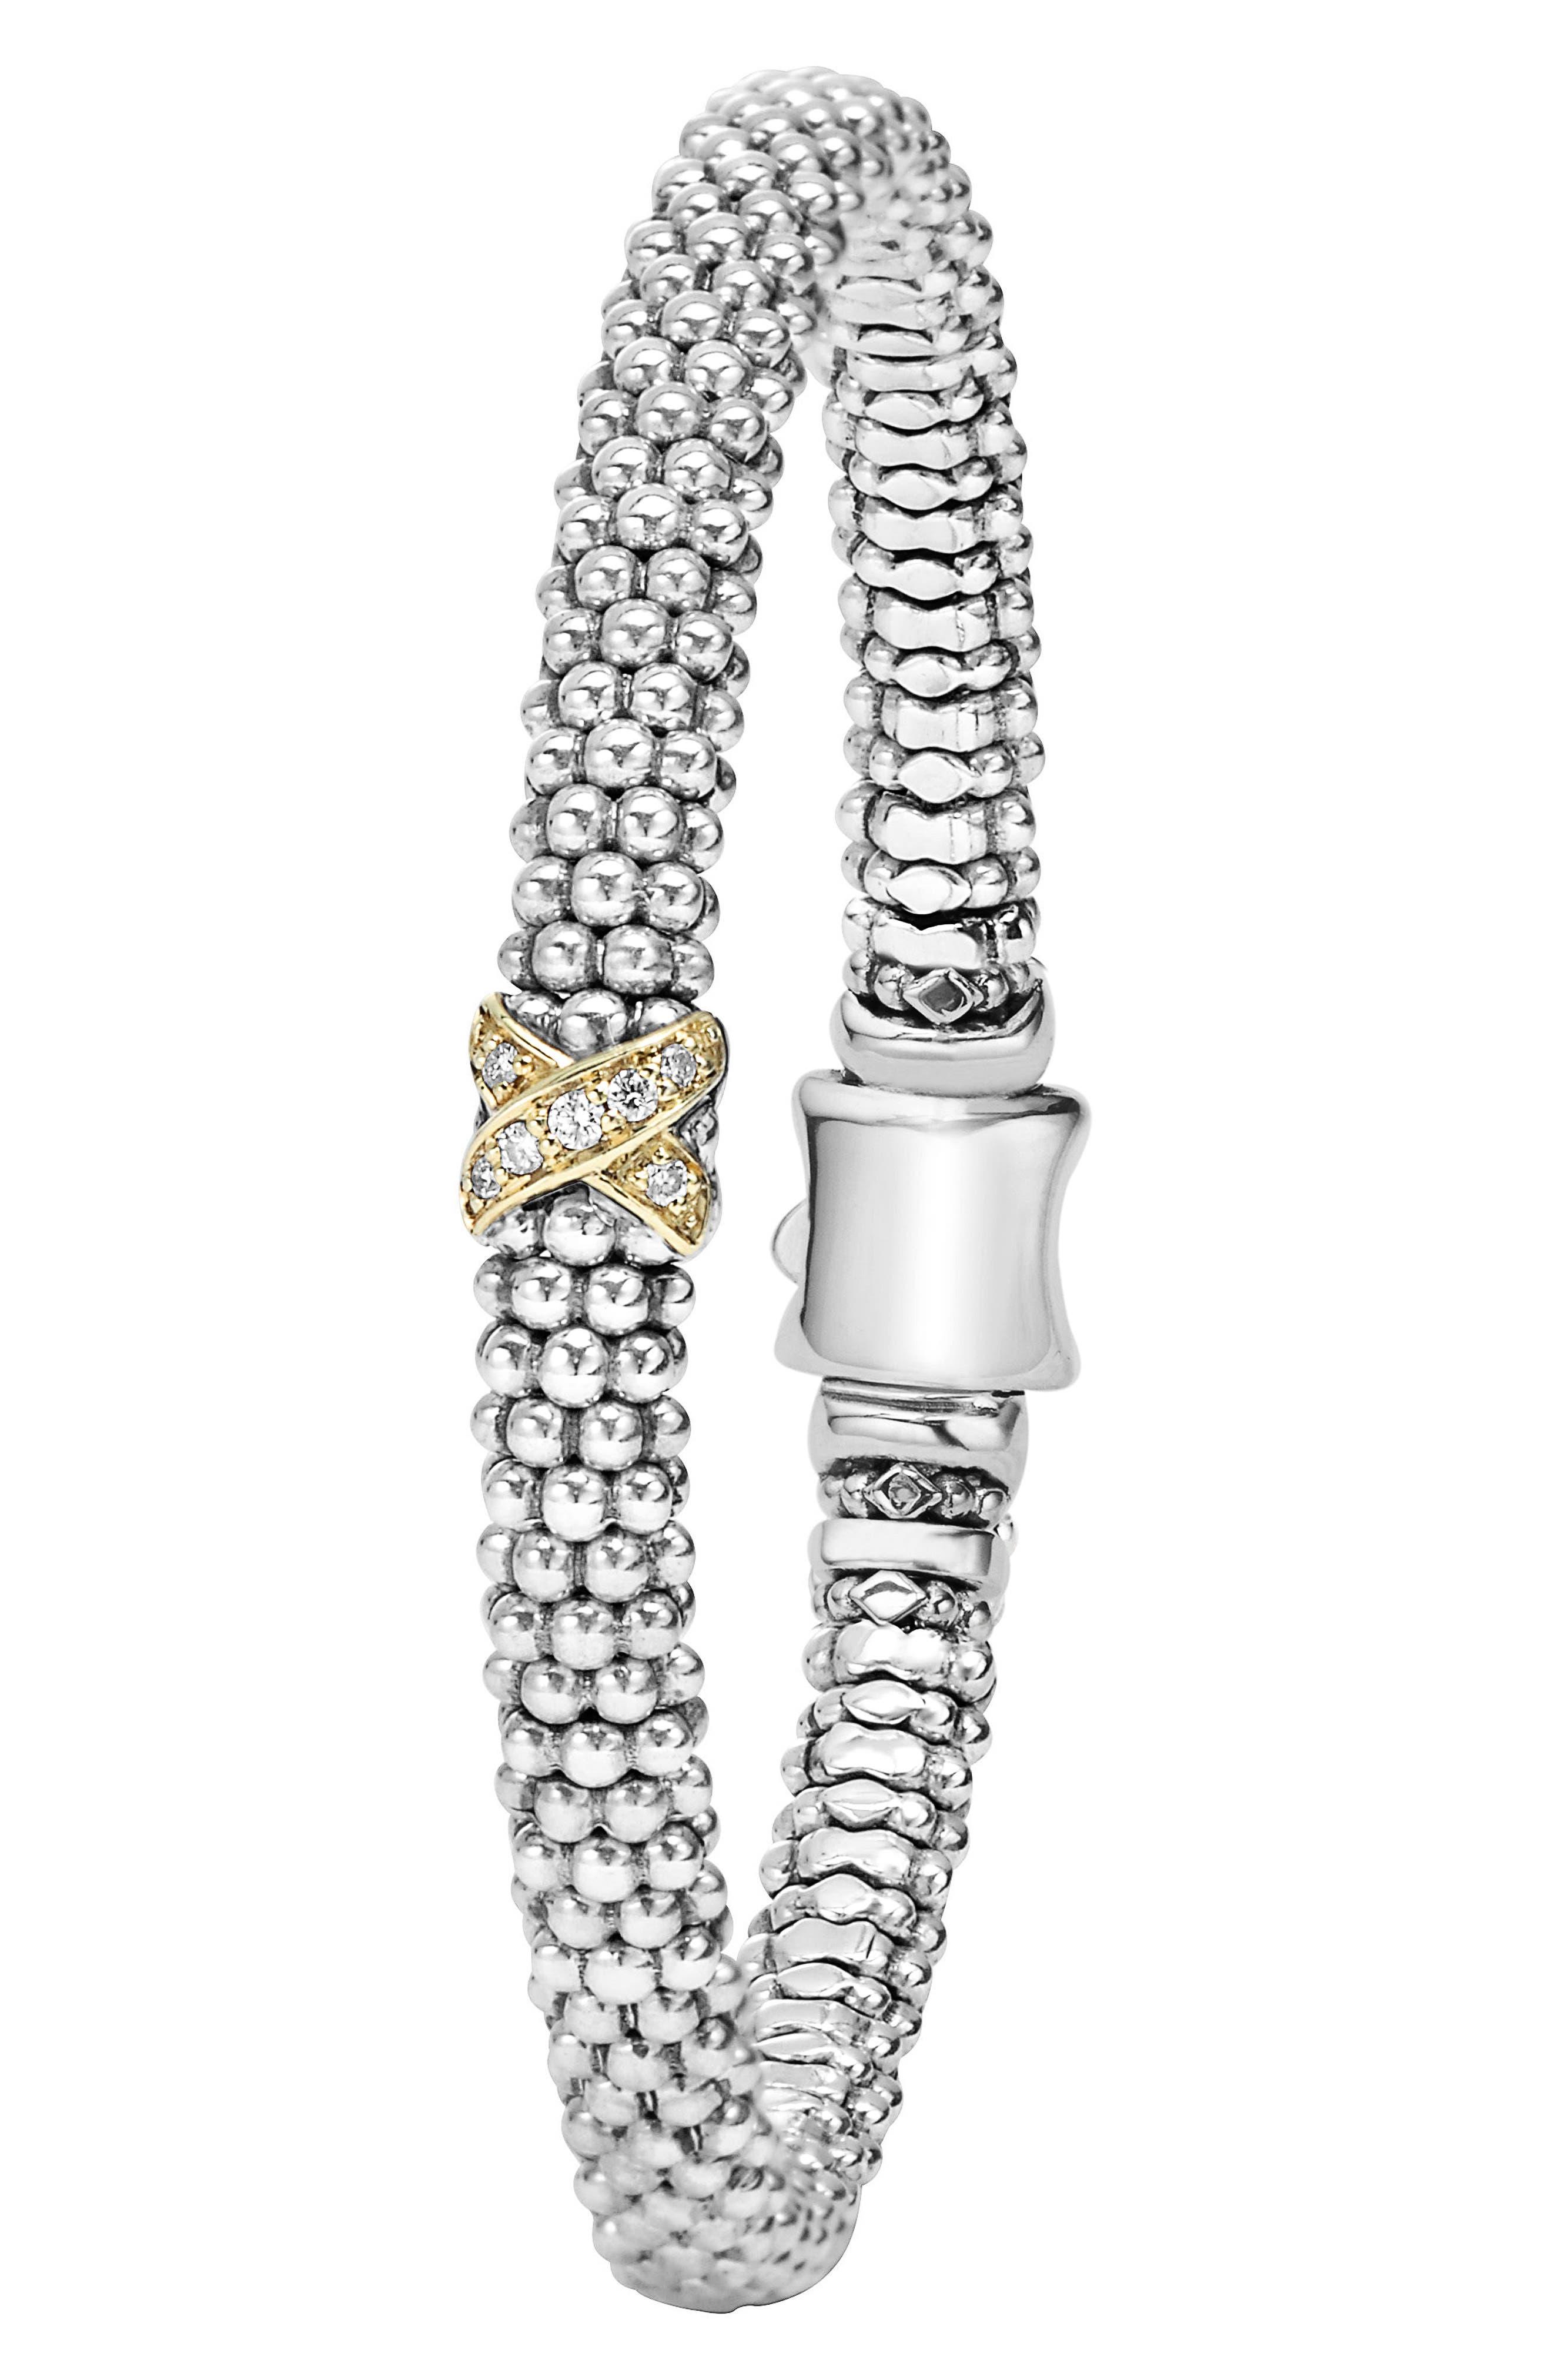 Caviar 'Signature Caviar' Diamond Rope Bracelet,                             Alternate thumbnail 2, color,                             STERLING SILVER/ GOLD